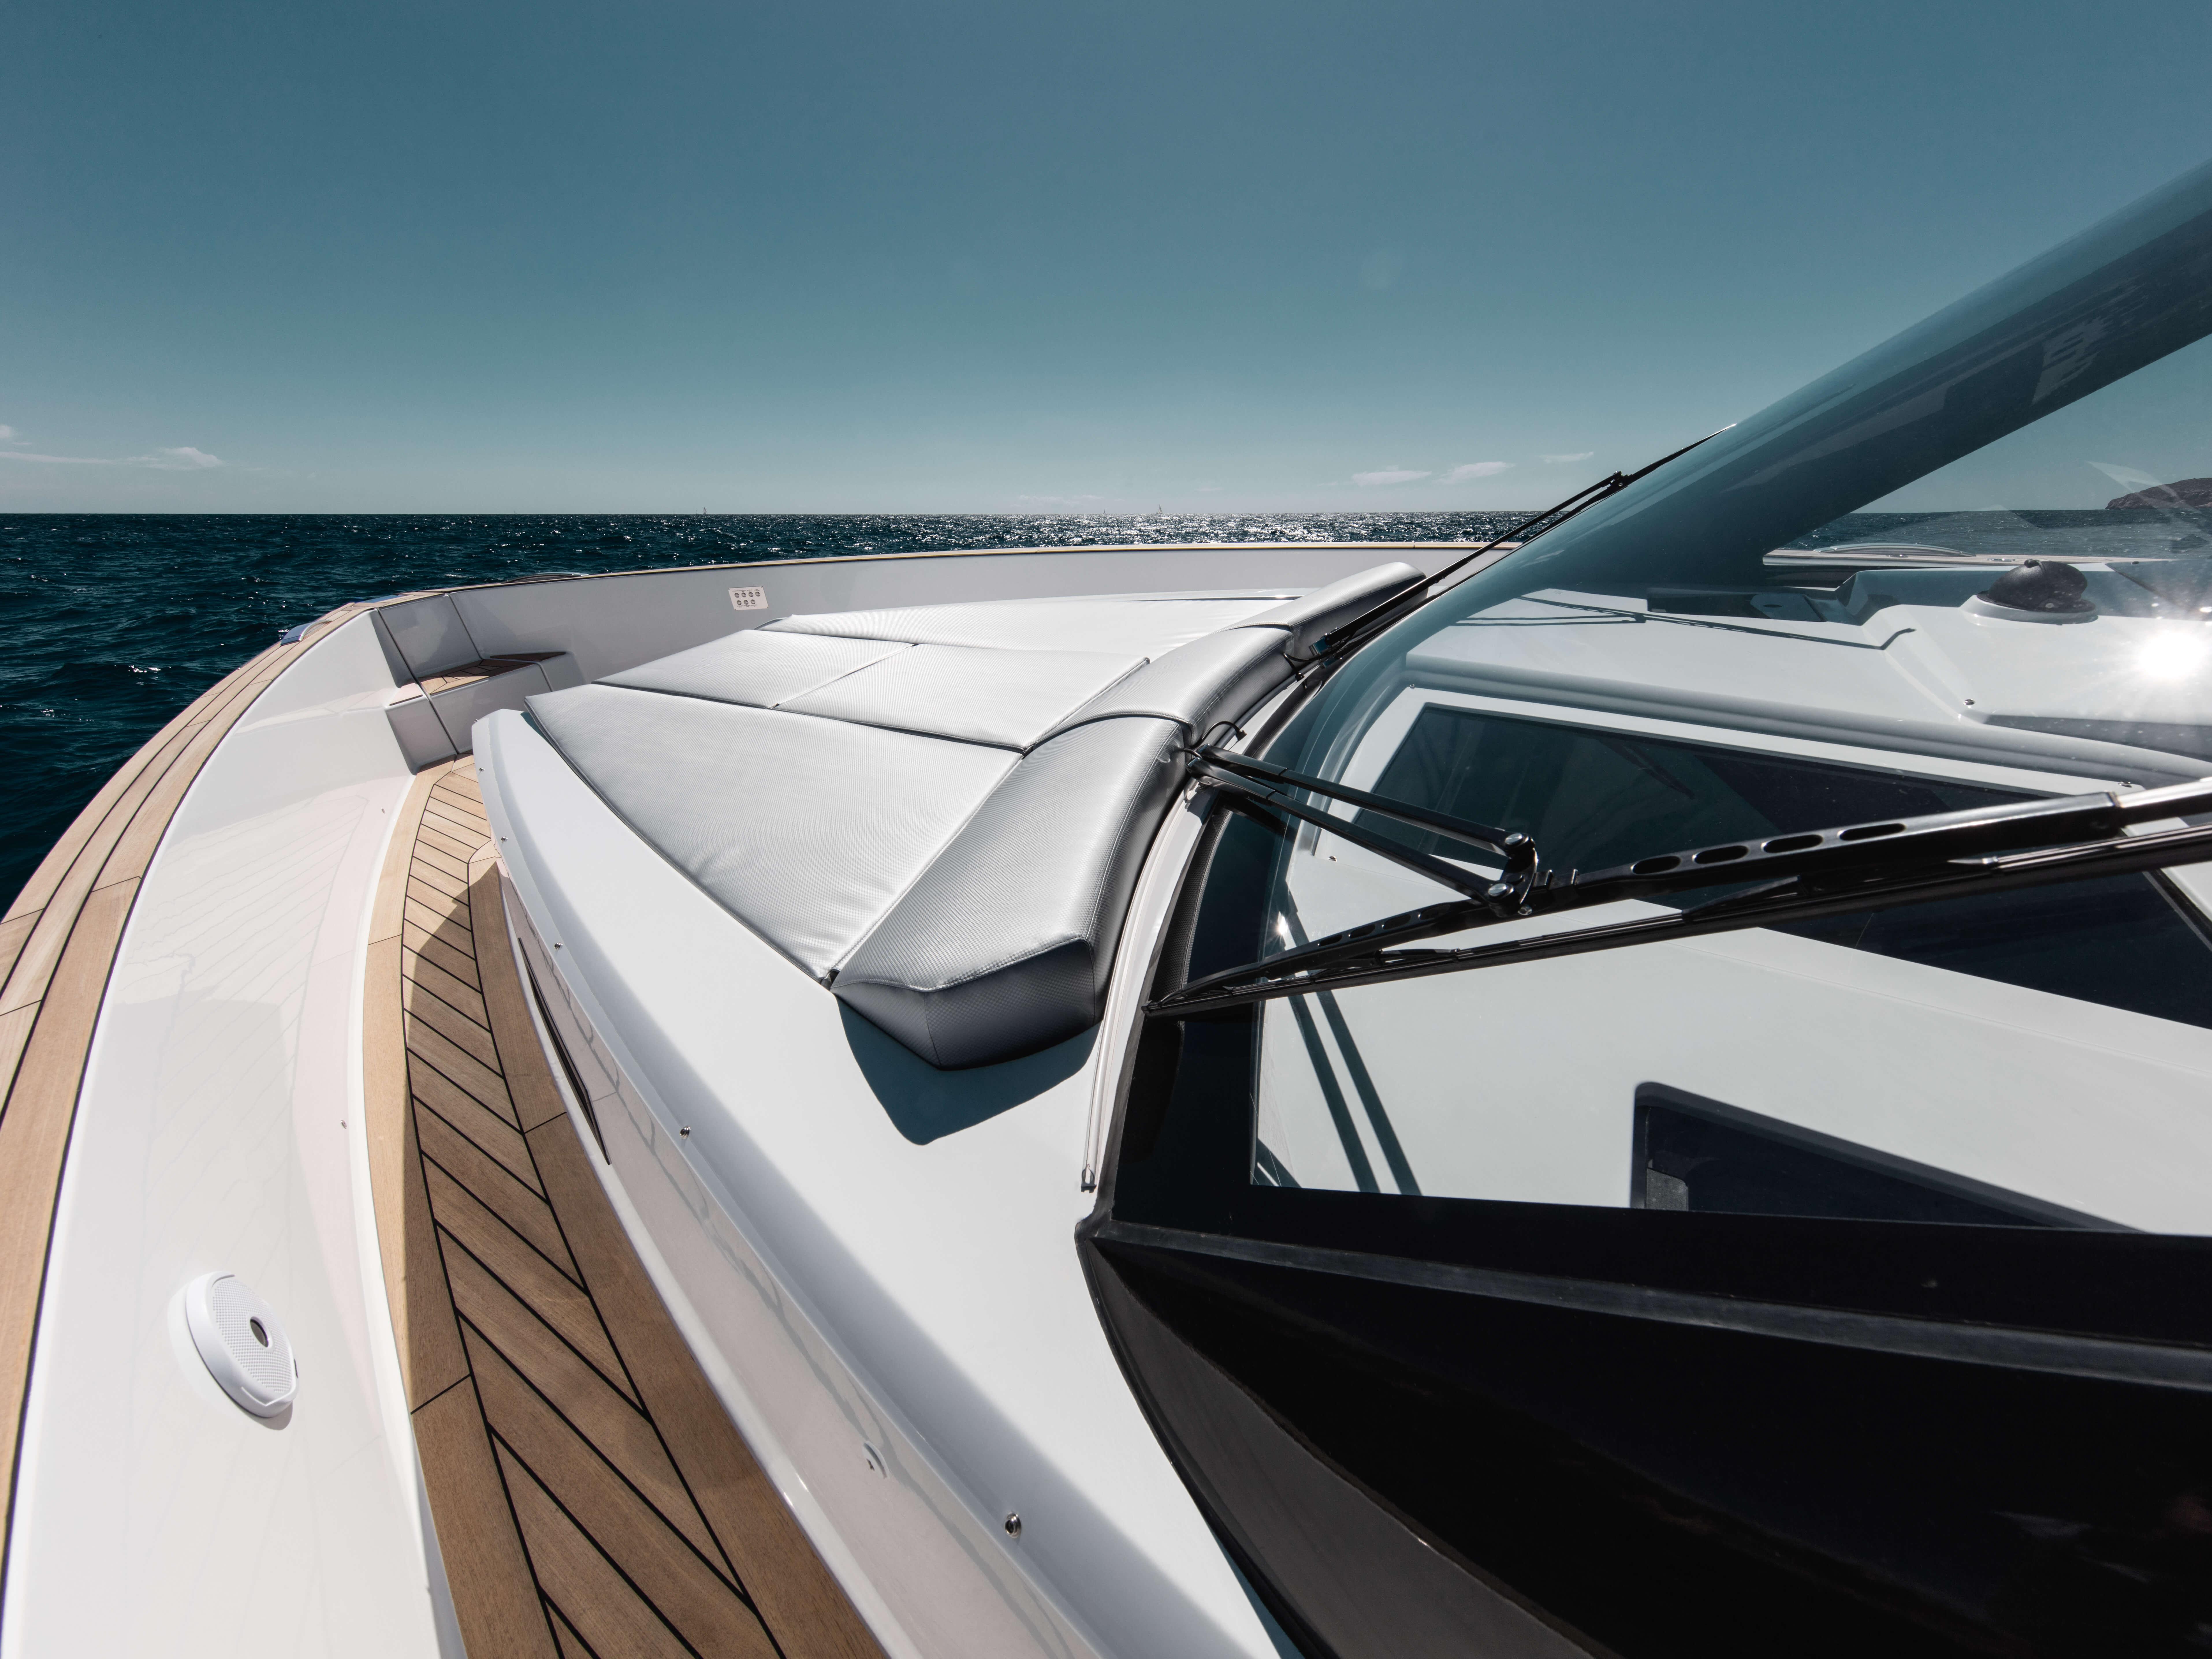 Fjord 48 open Exterior at anchor | teak on side deck and foredeck, fordeck sunbed | Fjord